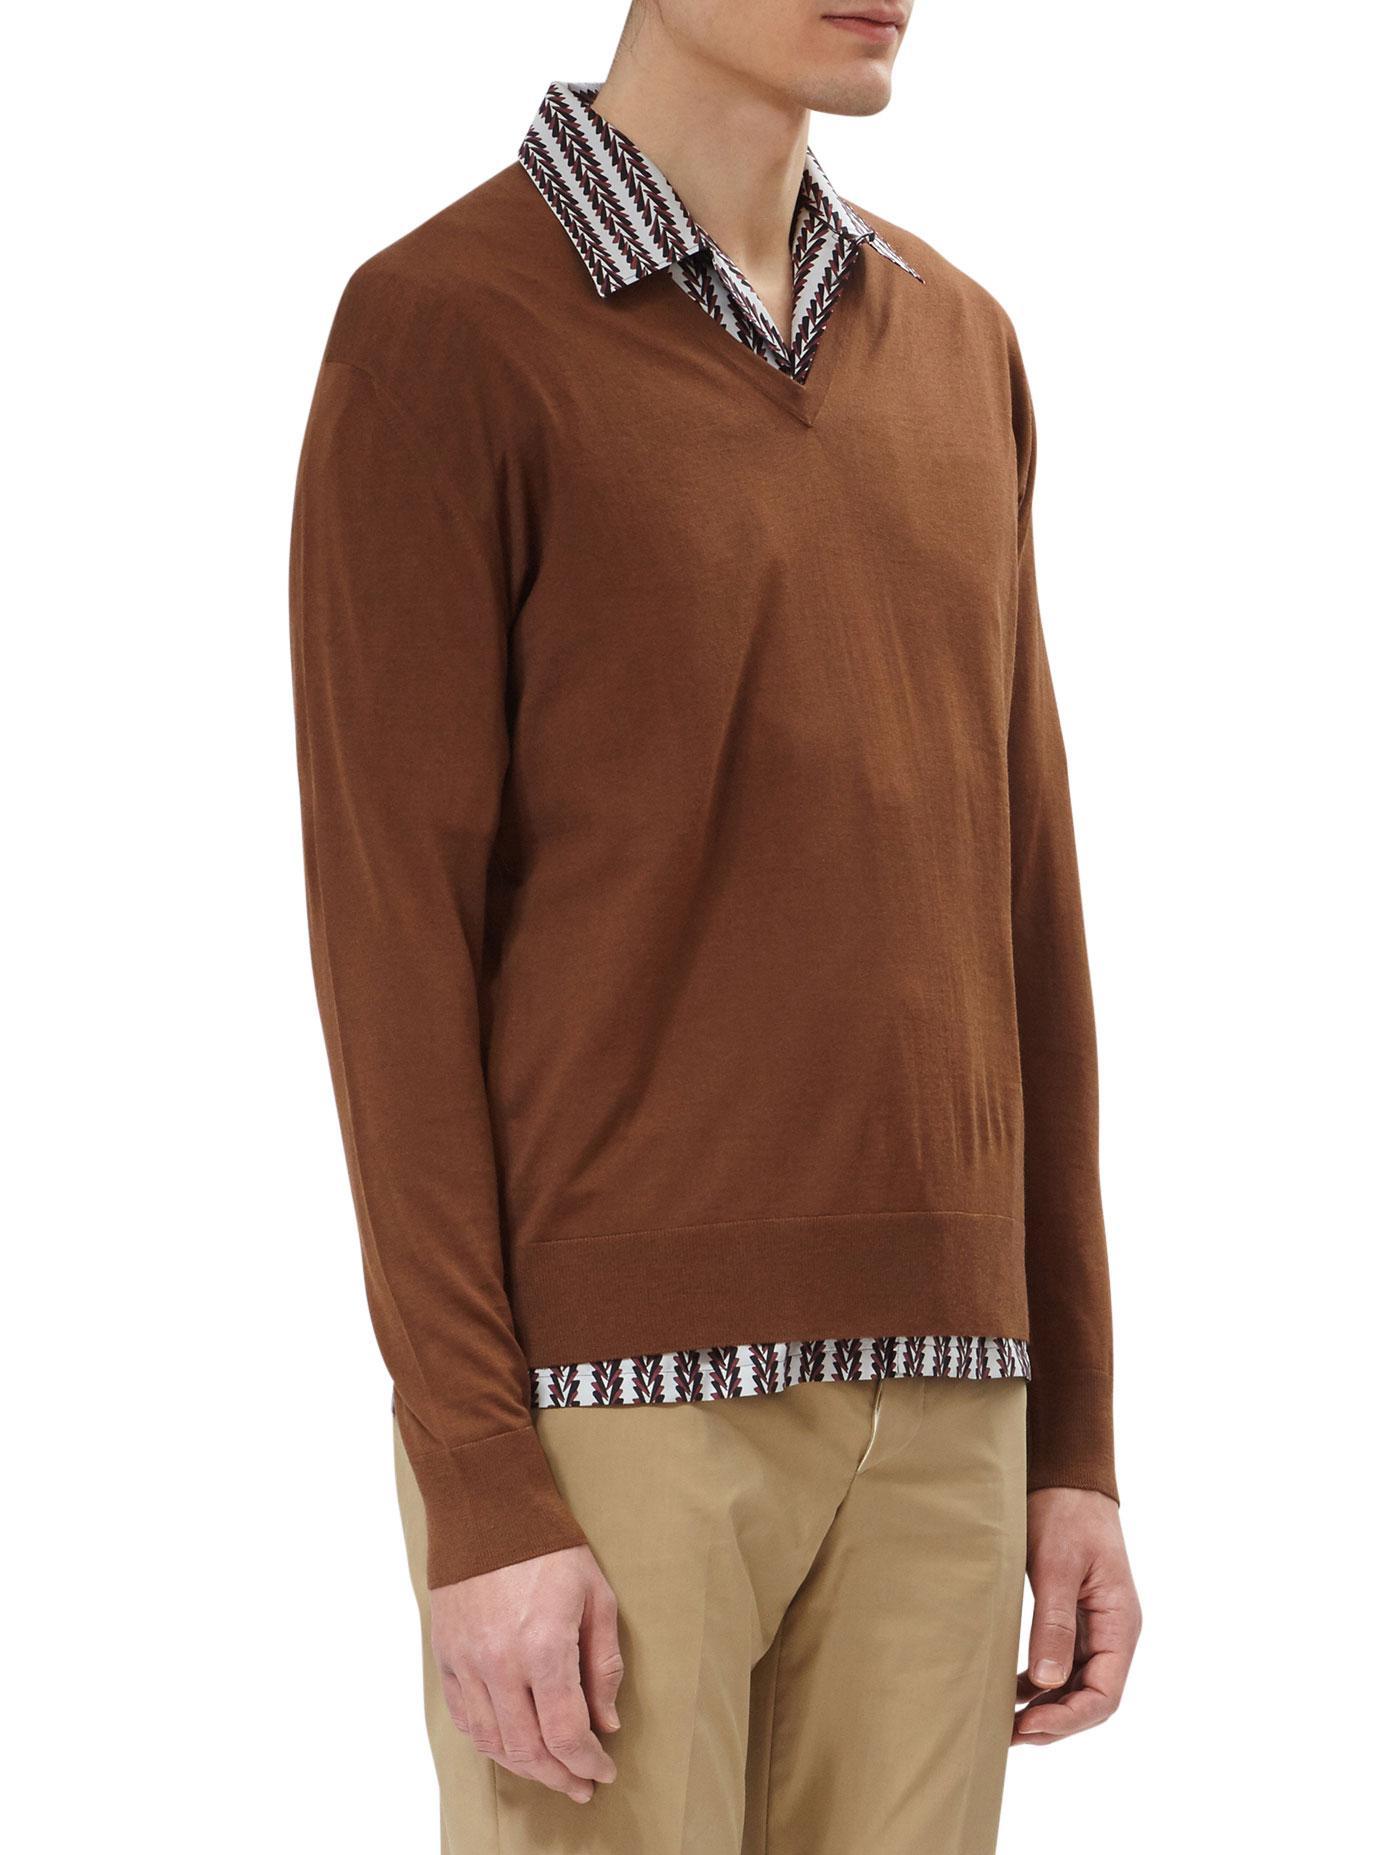 Prada V-neck Virgin Wool Knit in Brown for Men